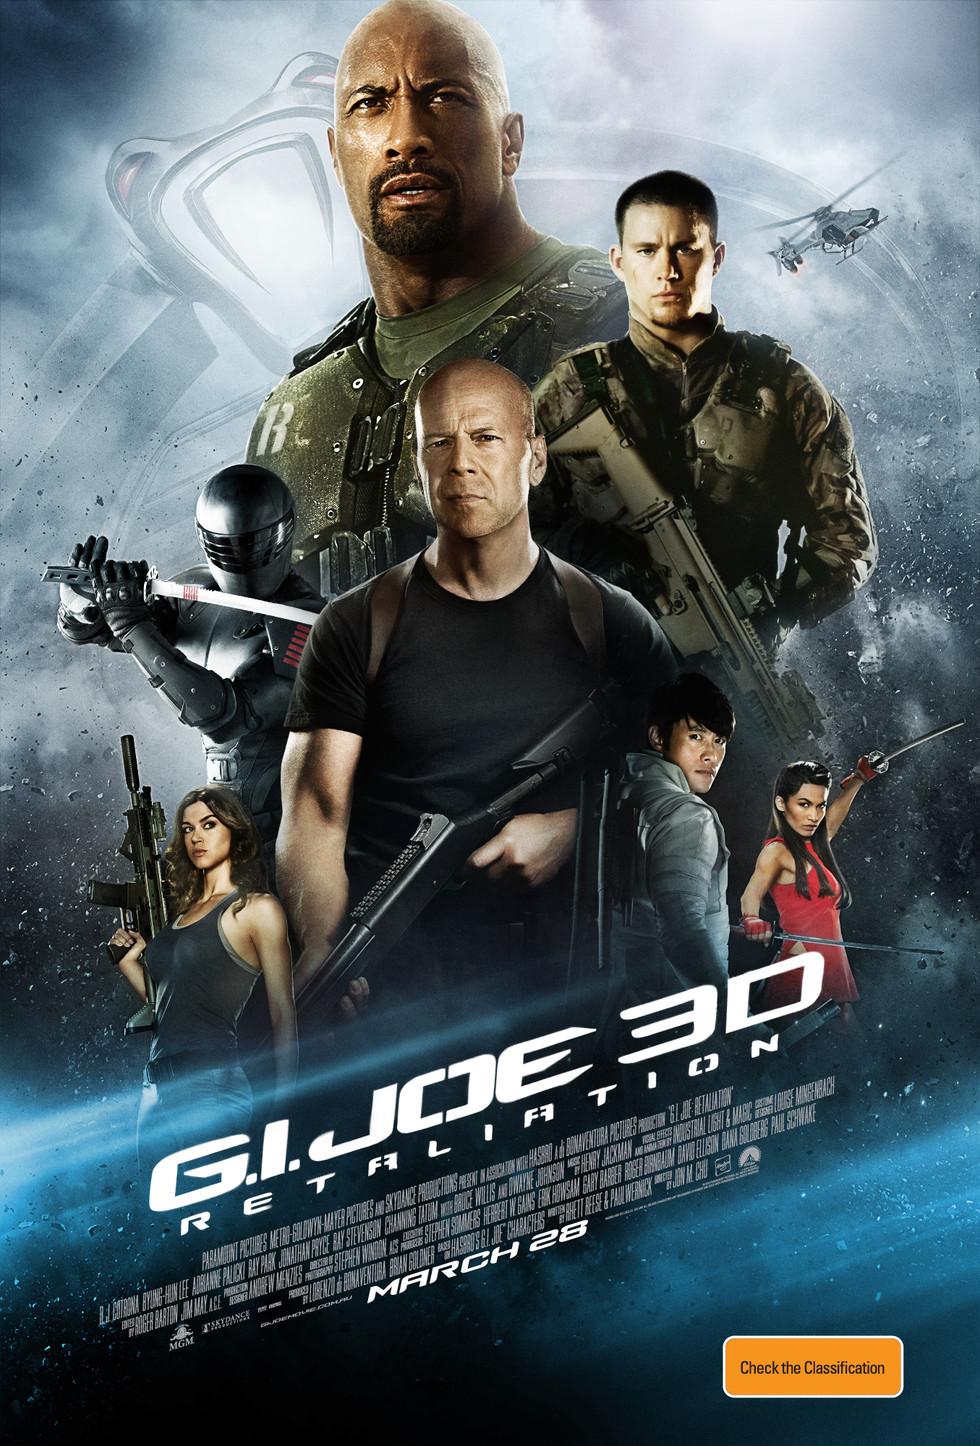 G.I. Joe: Retaliation - Movie Poster #14 (Large)